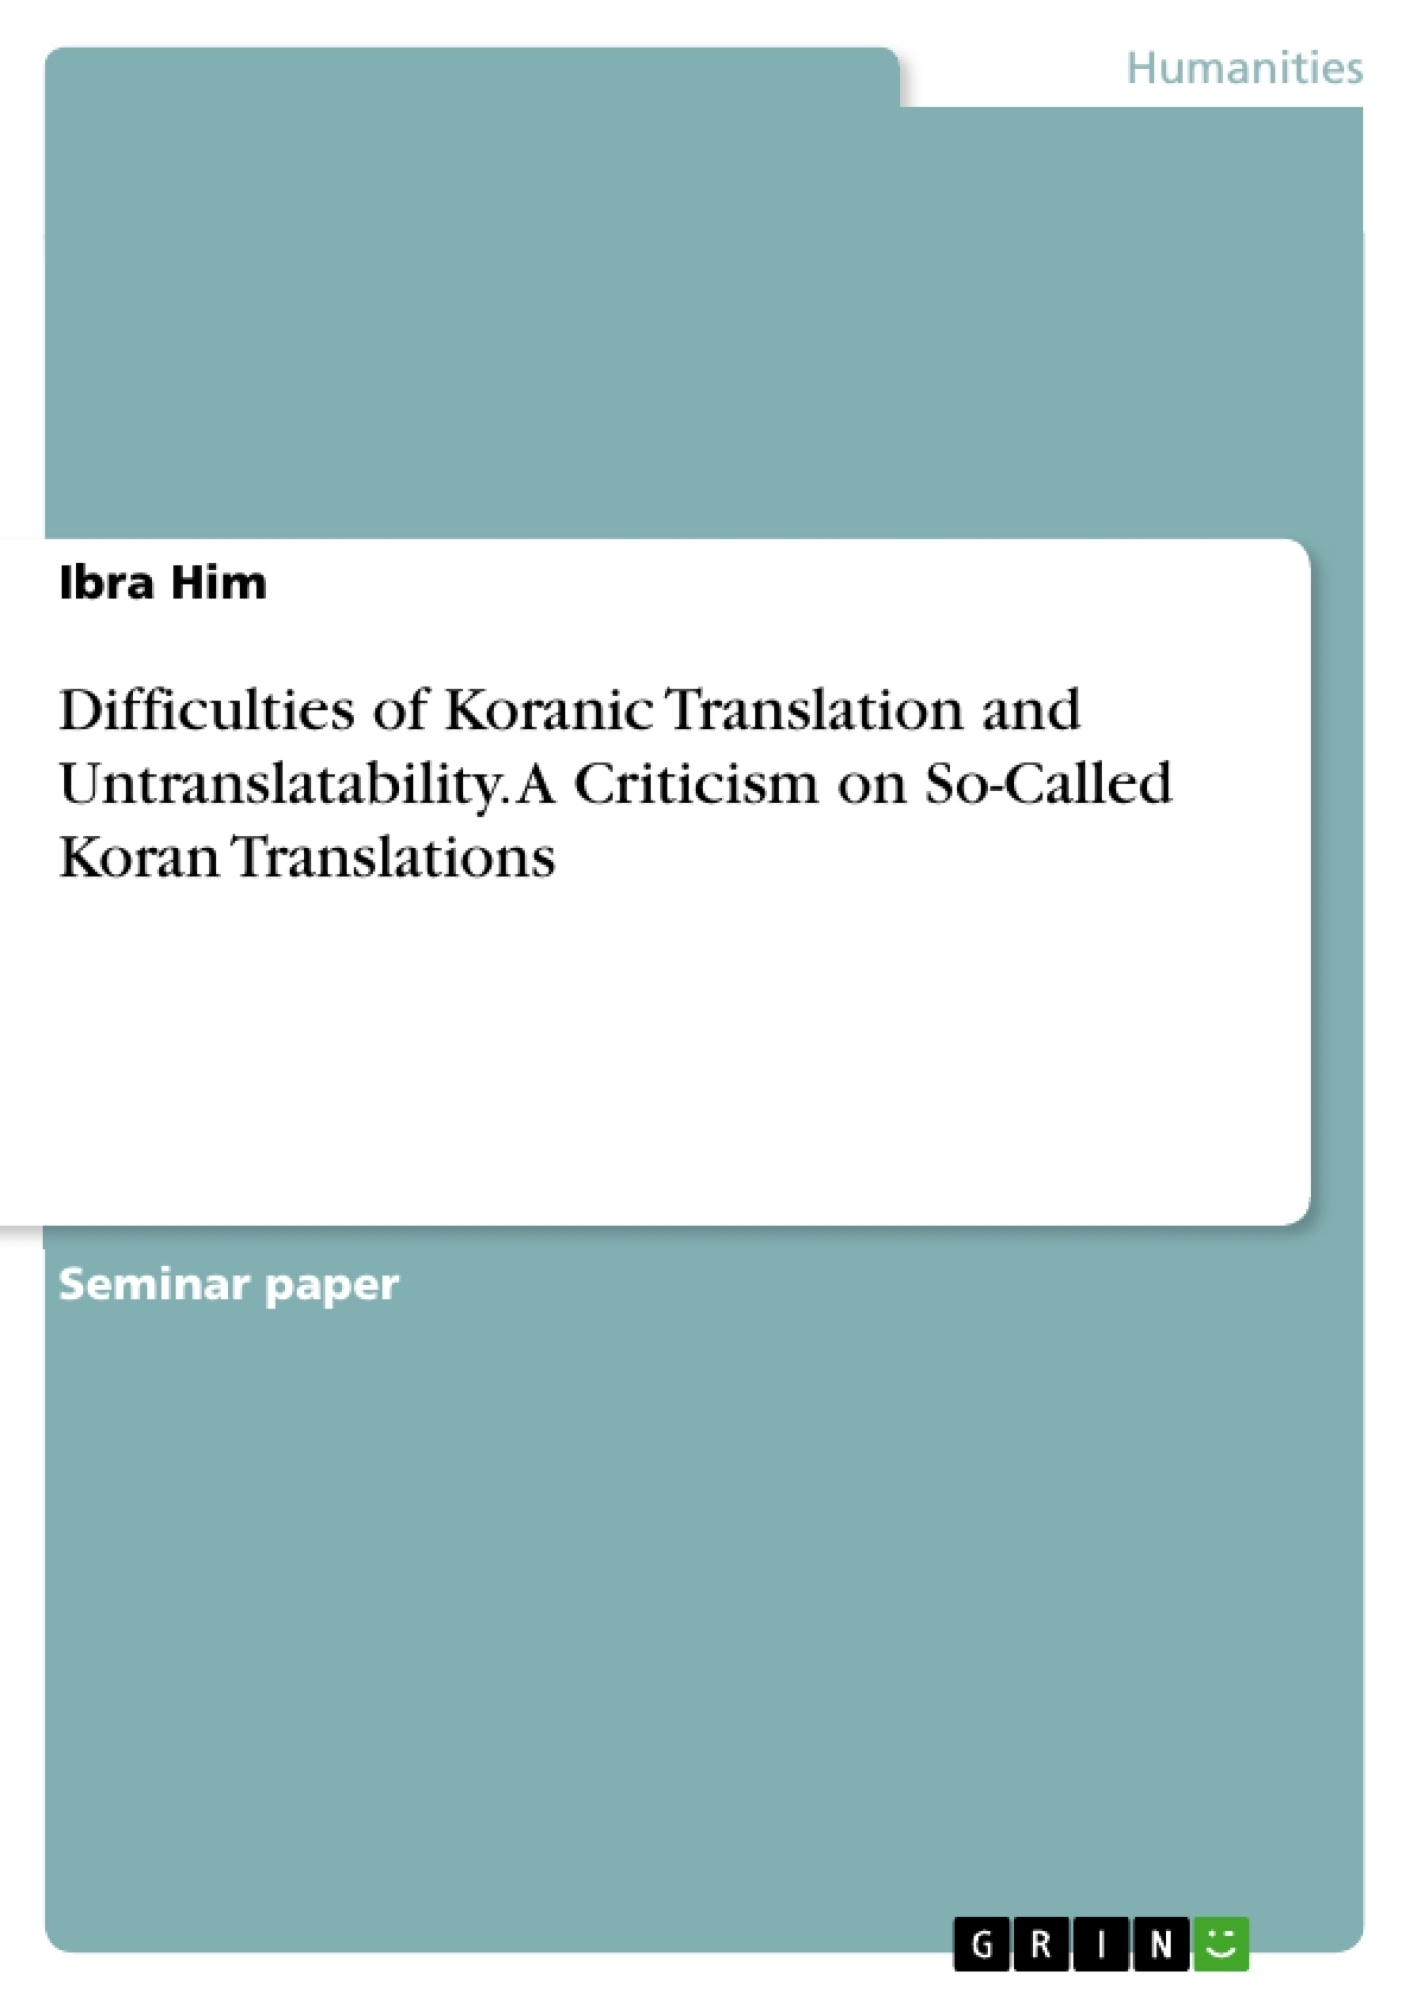 Title: Difficulties of Koranic Translation and Untranslatability. A Criticism on So-Called Koran Translations